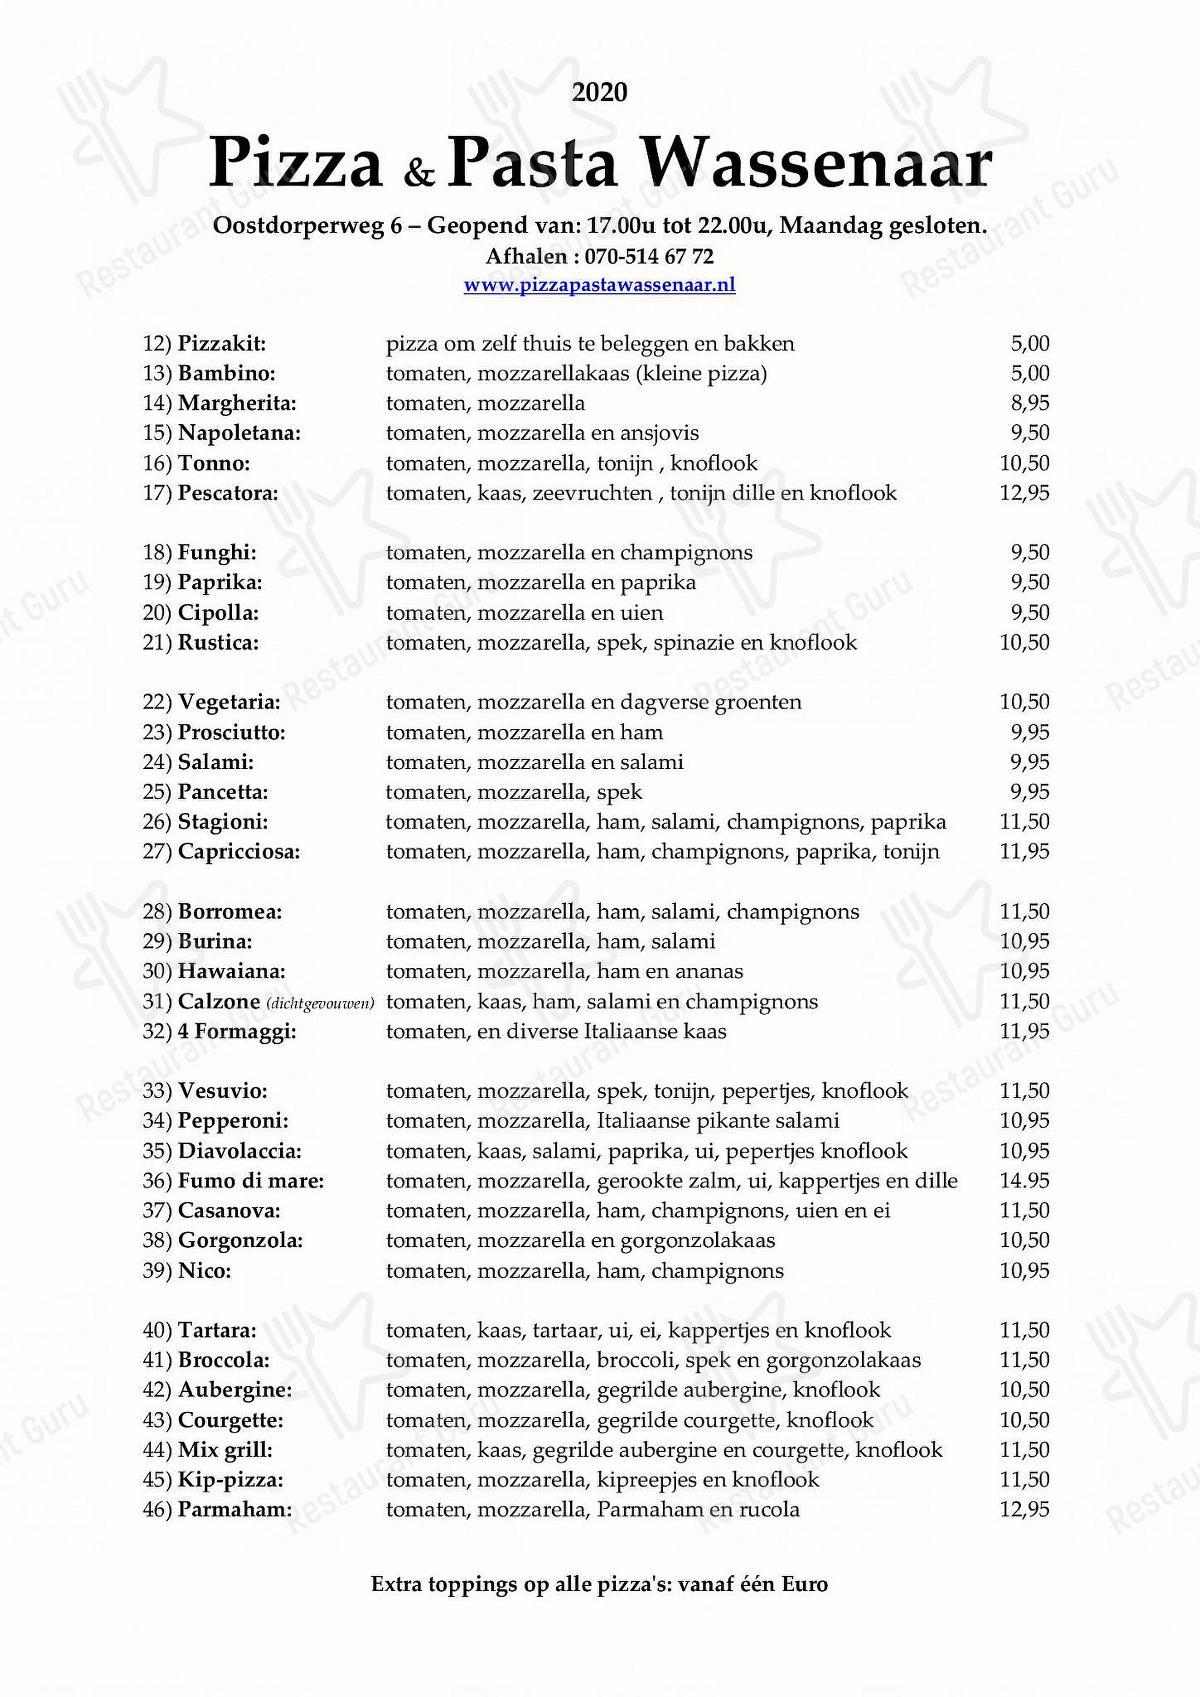 Carta de Pizza & Pasta Wassenaar